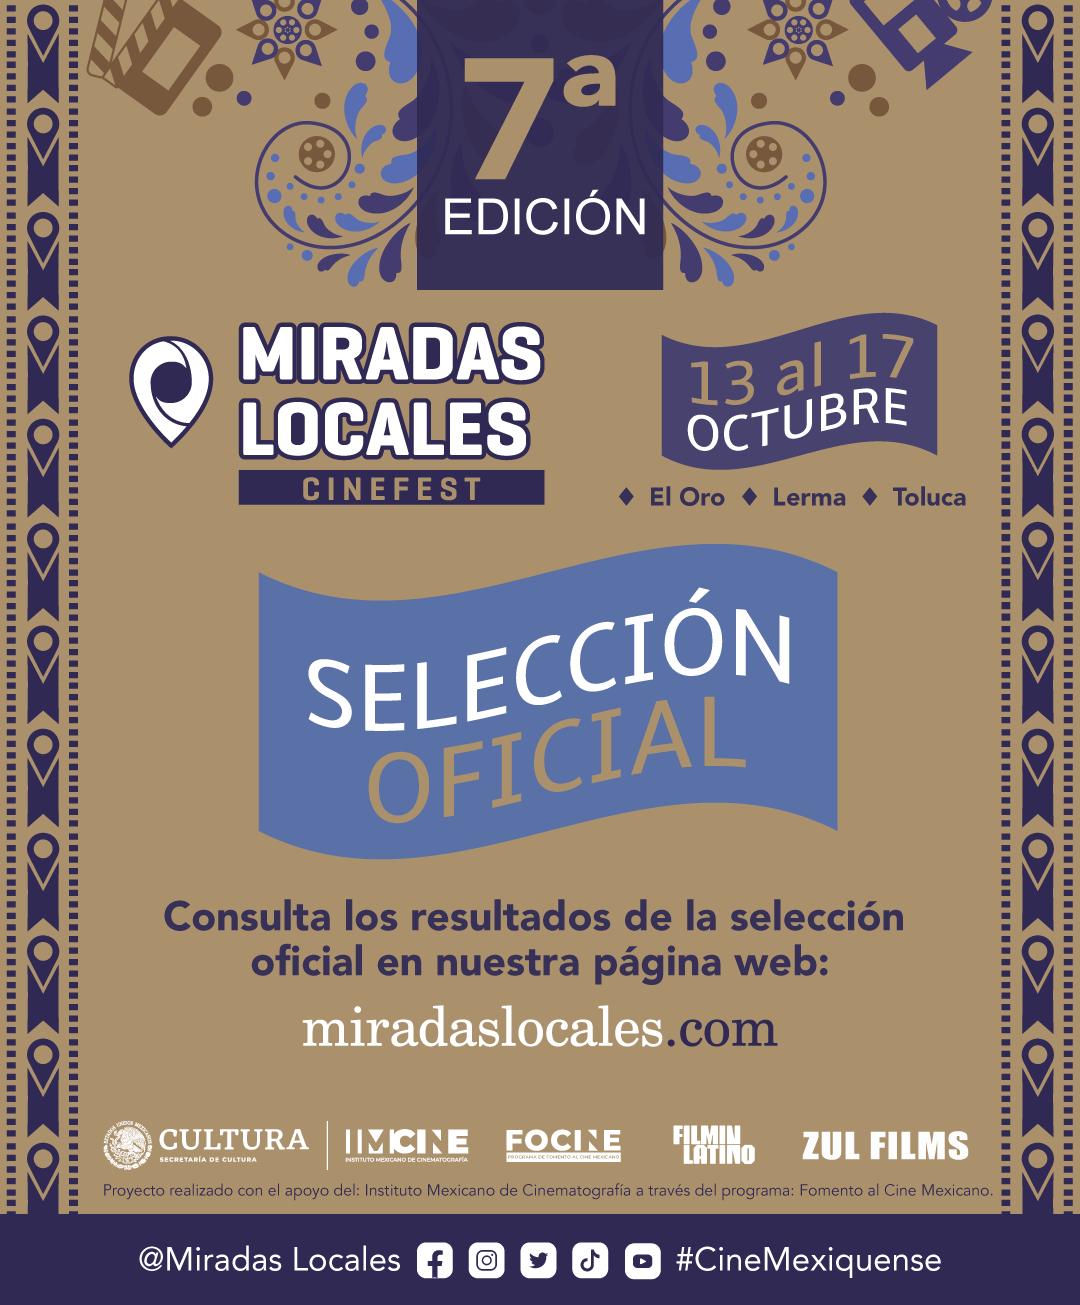 Selección Oficial Festival de Cine Miradas Locales